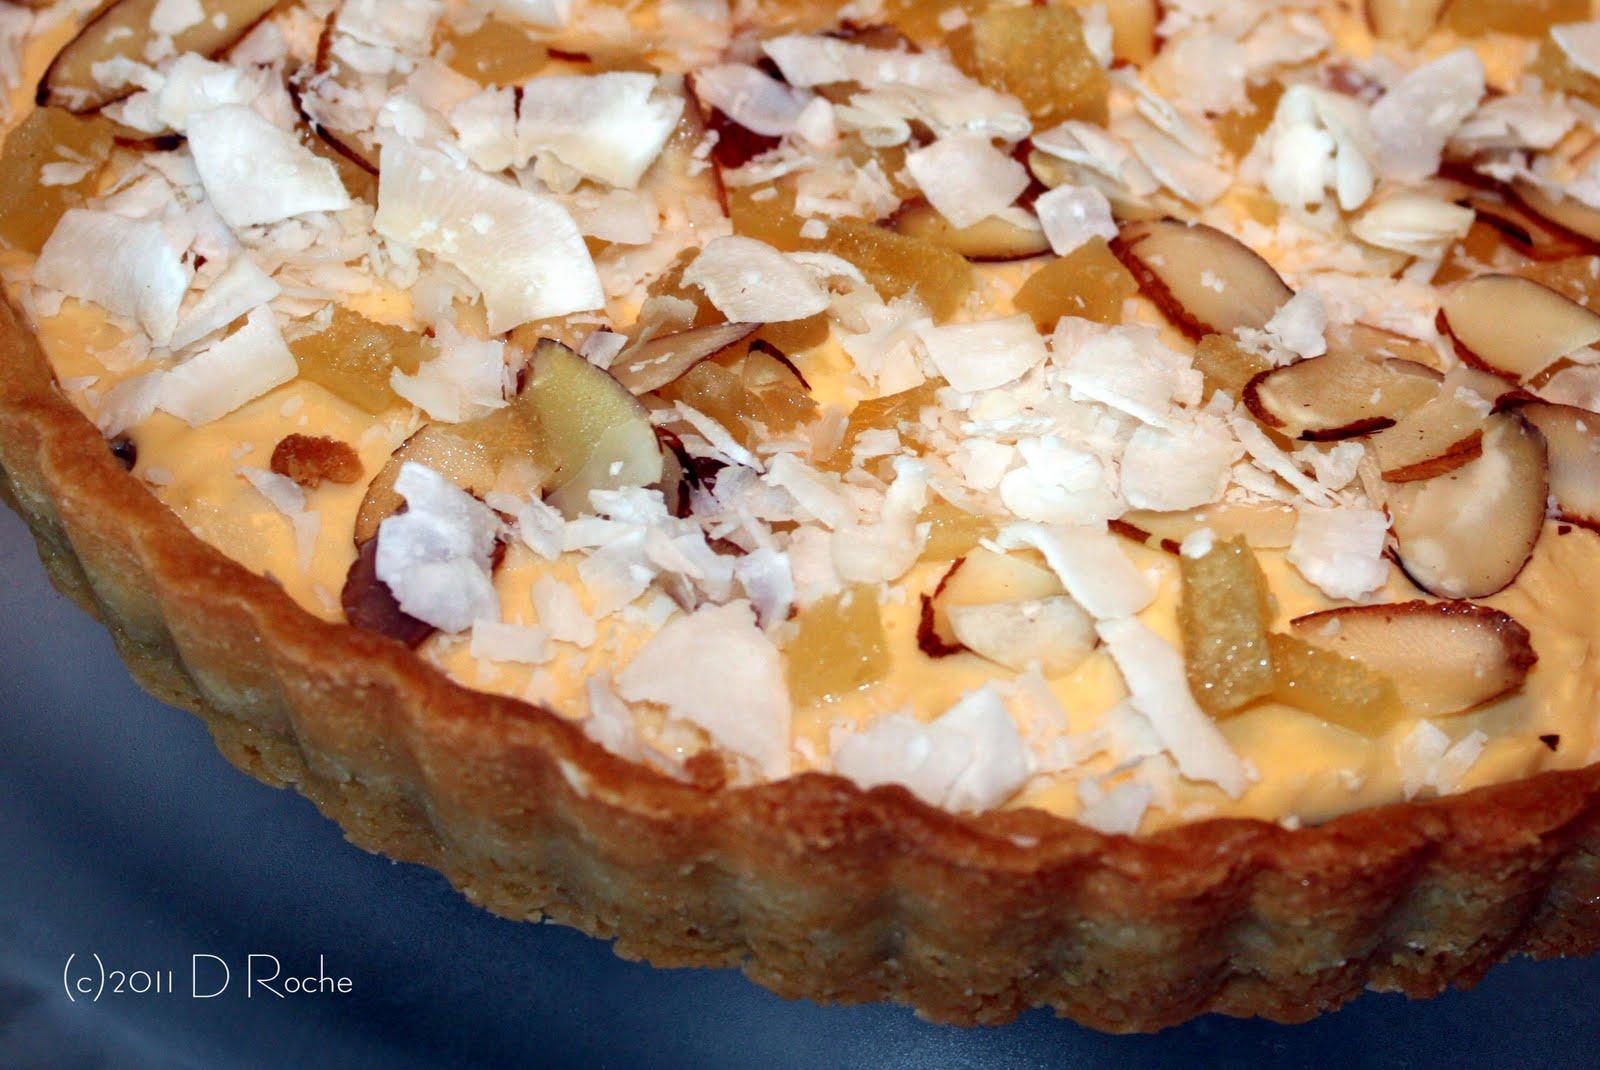 ... with Nick ...: Banana Coconut Custard Tart --- not just another tart